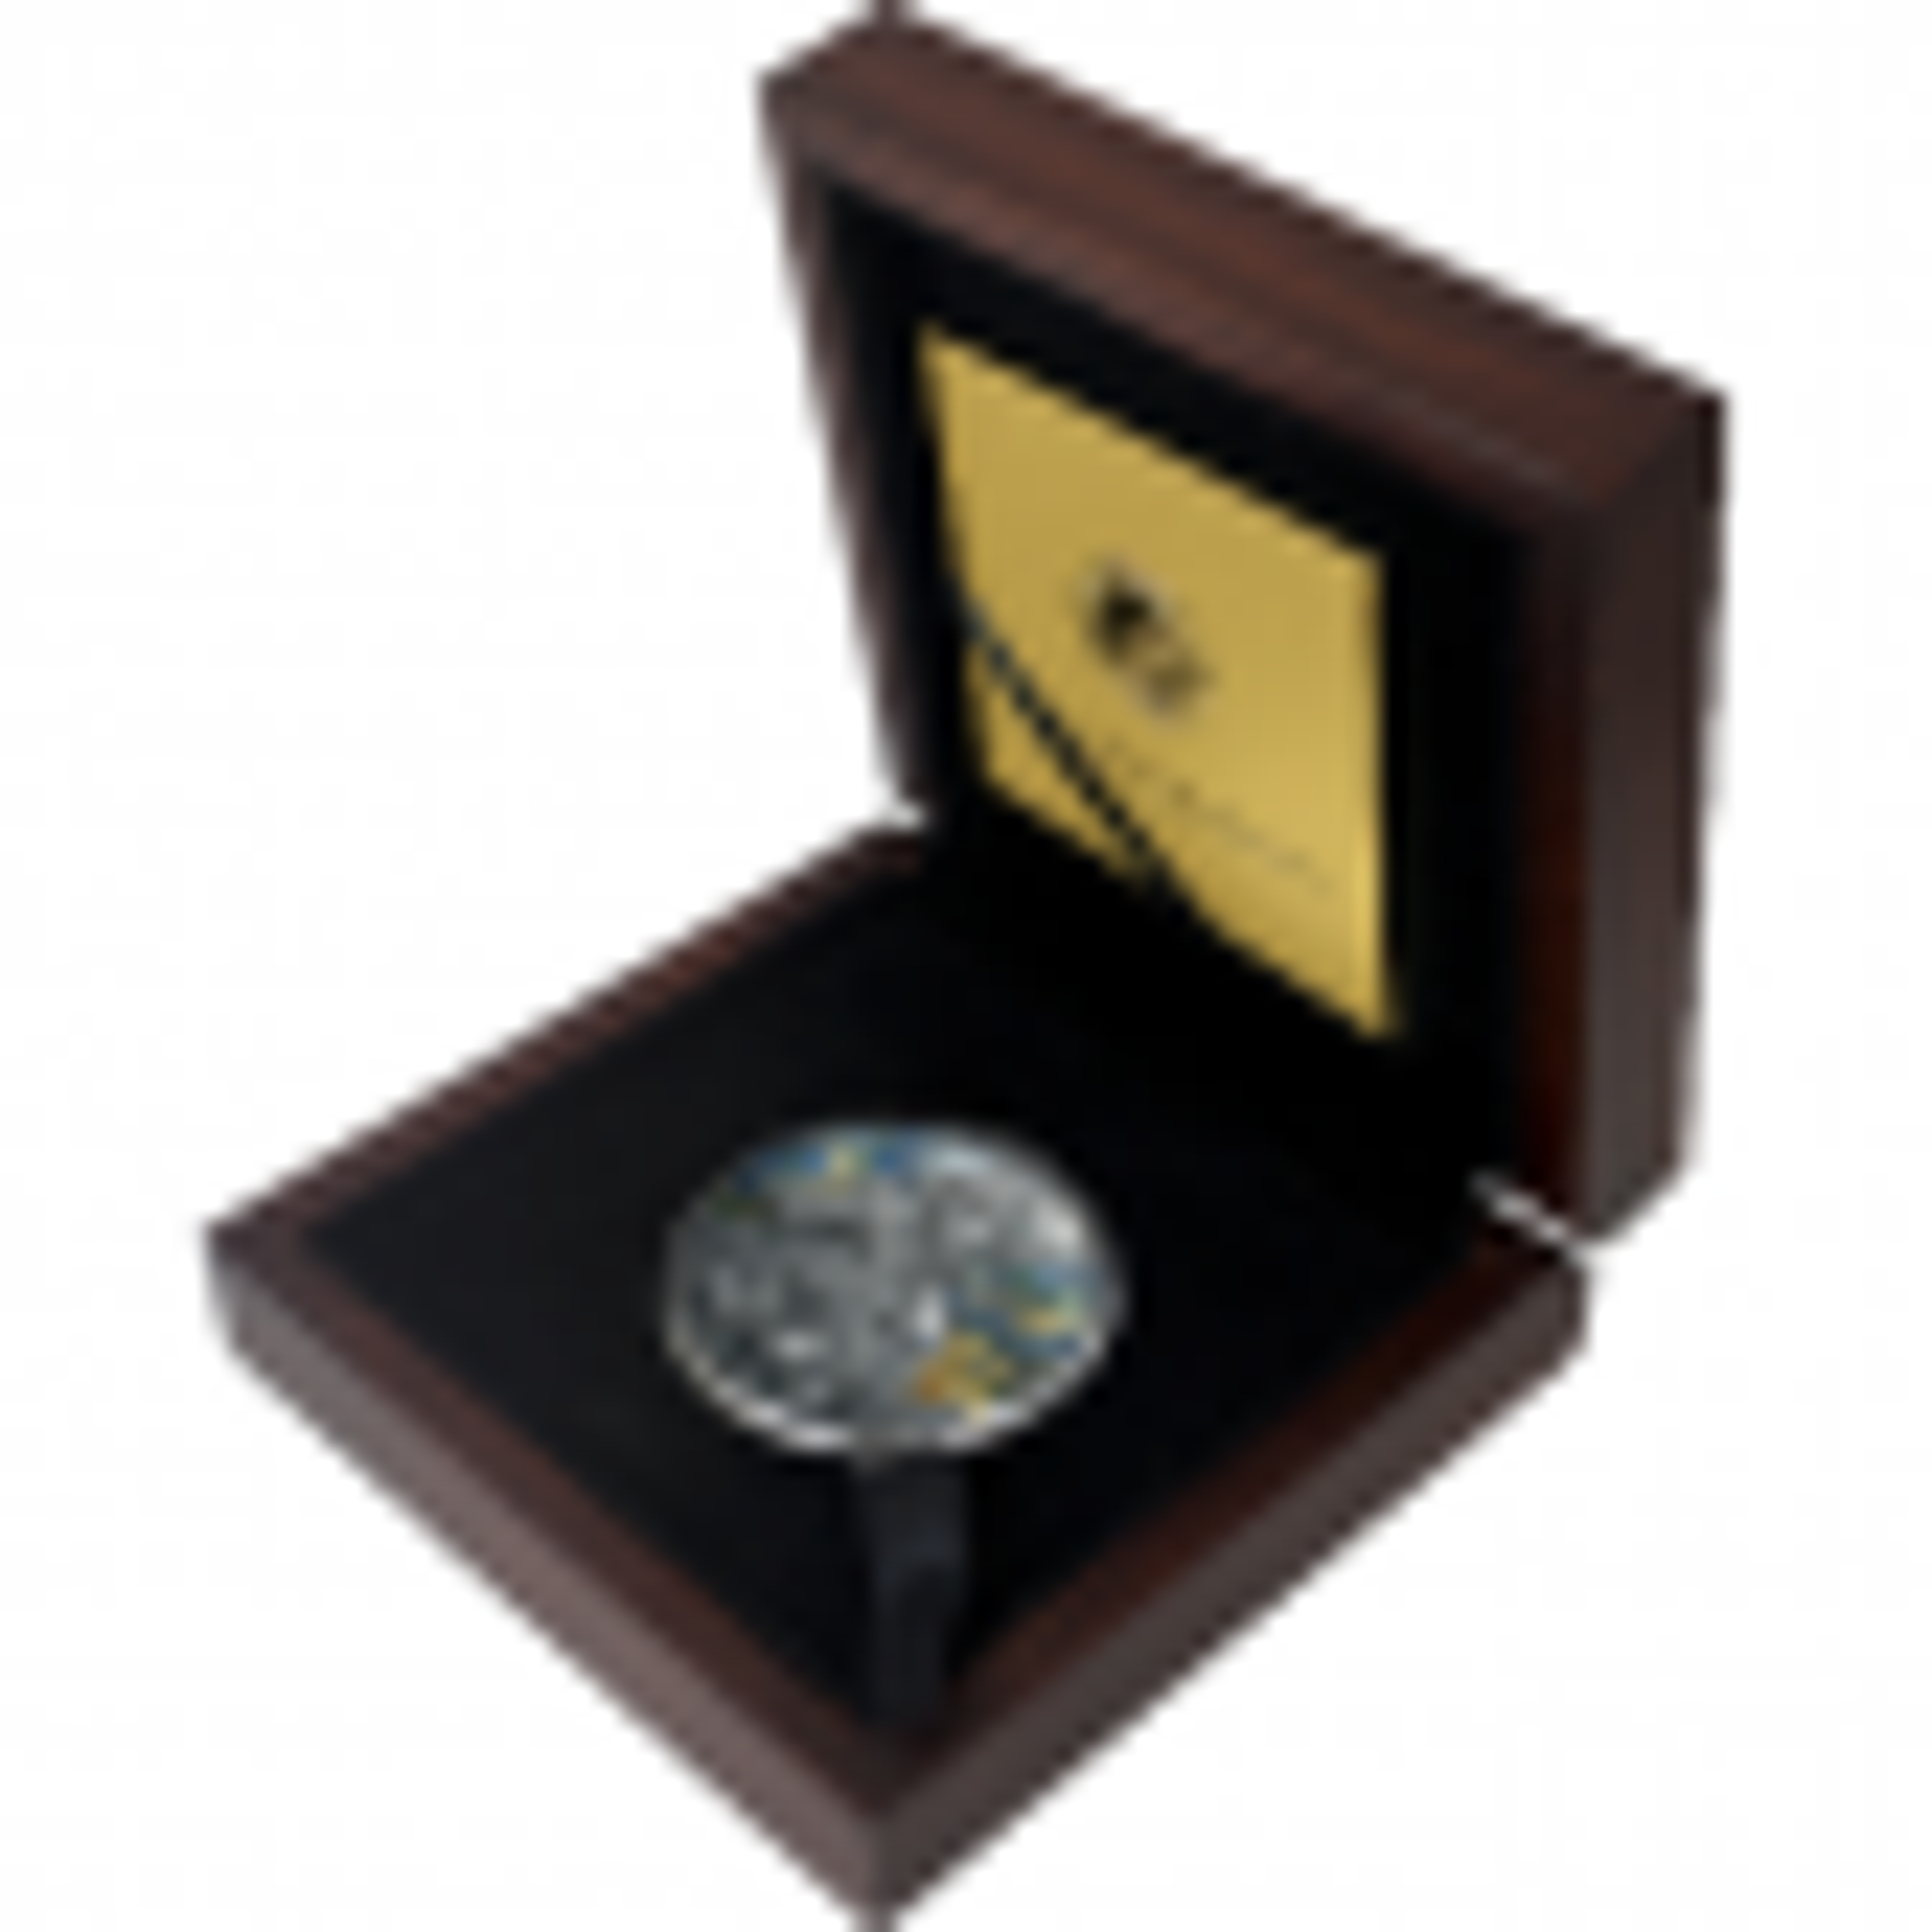 3 troy ounce zilveren munt Zhang Fei 2020